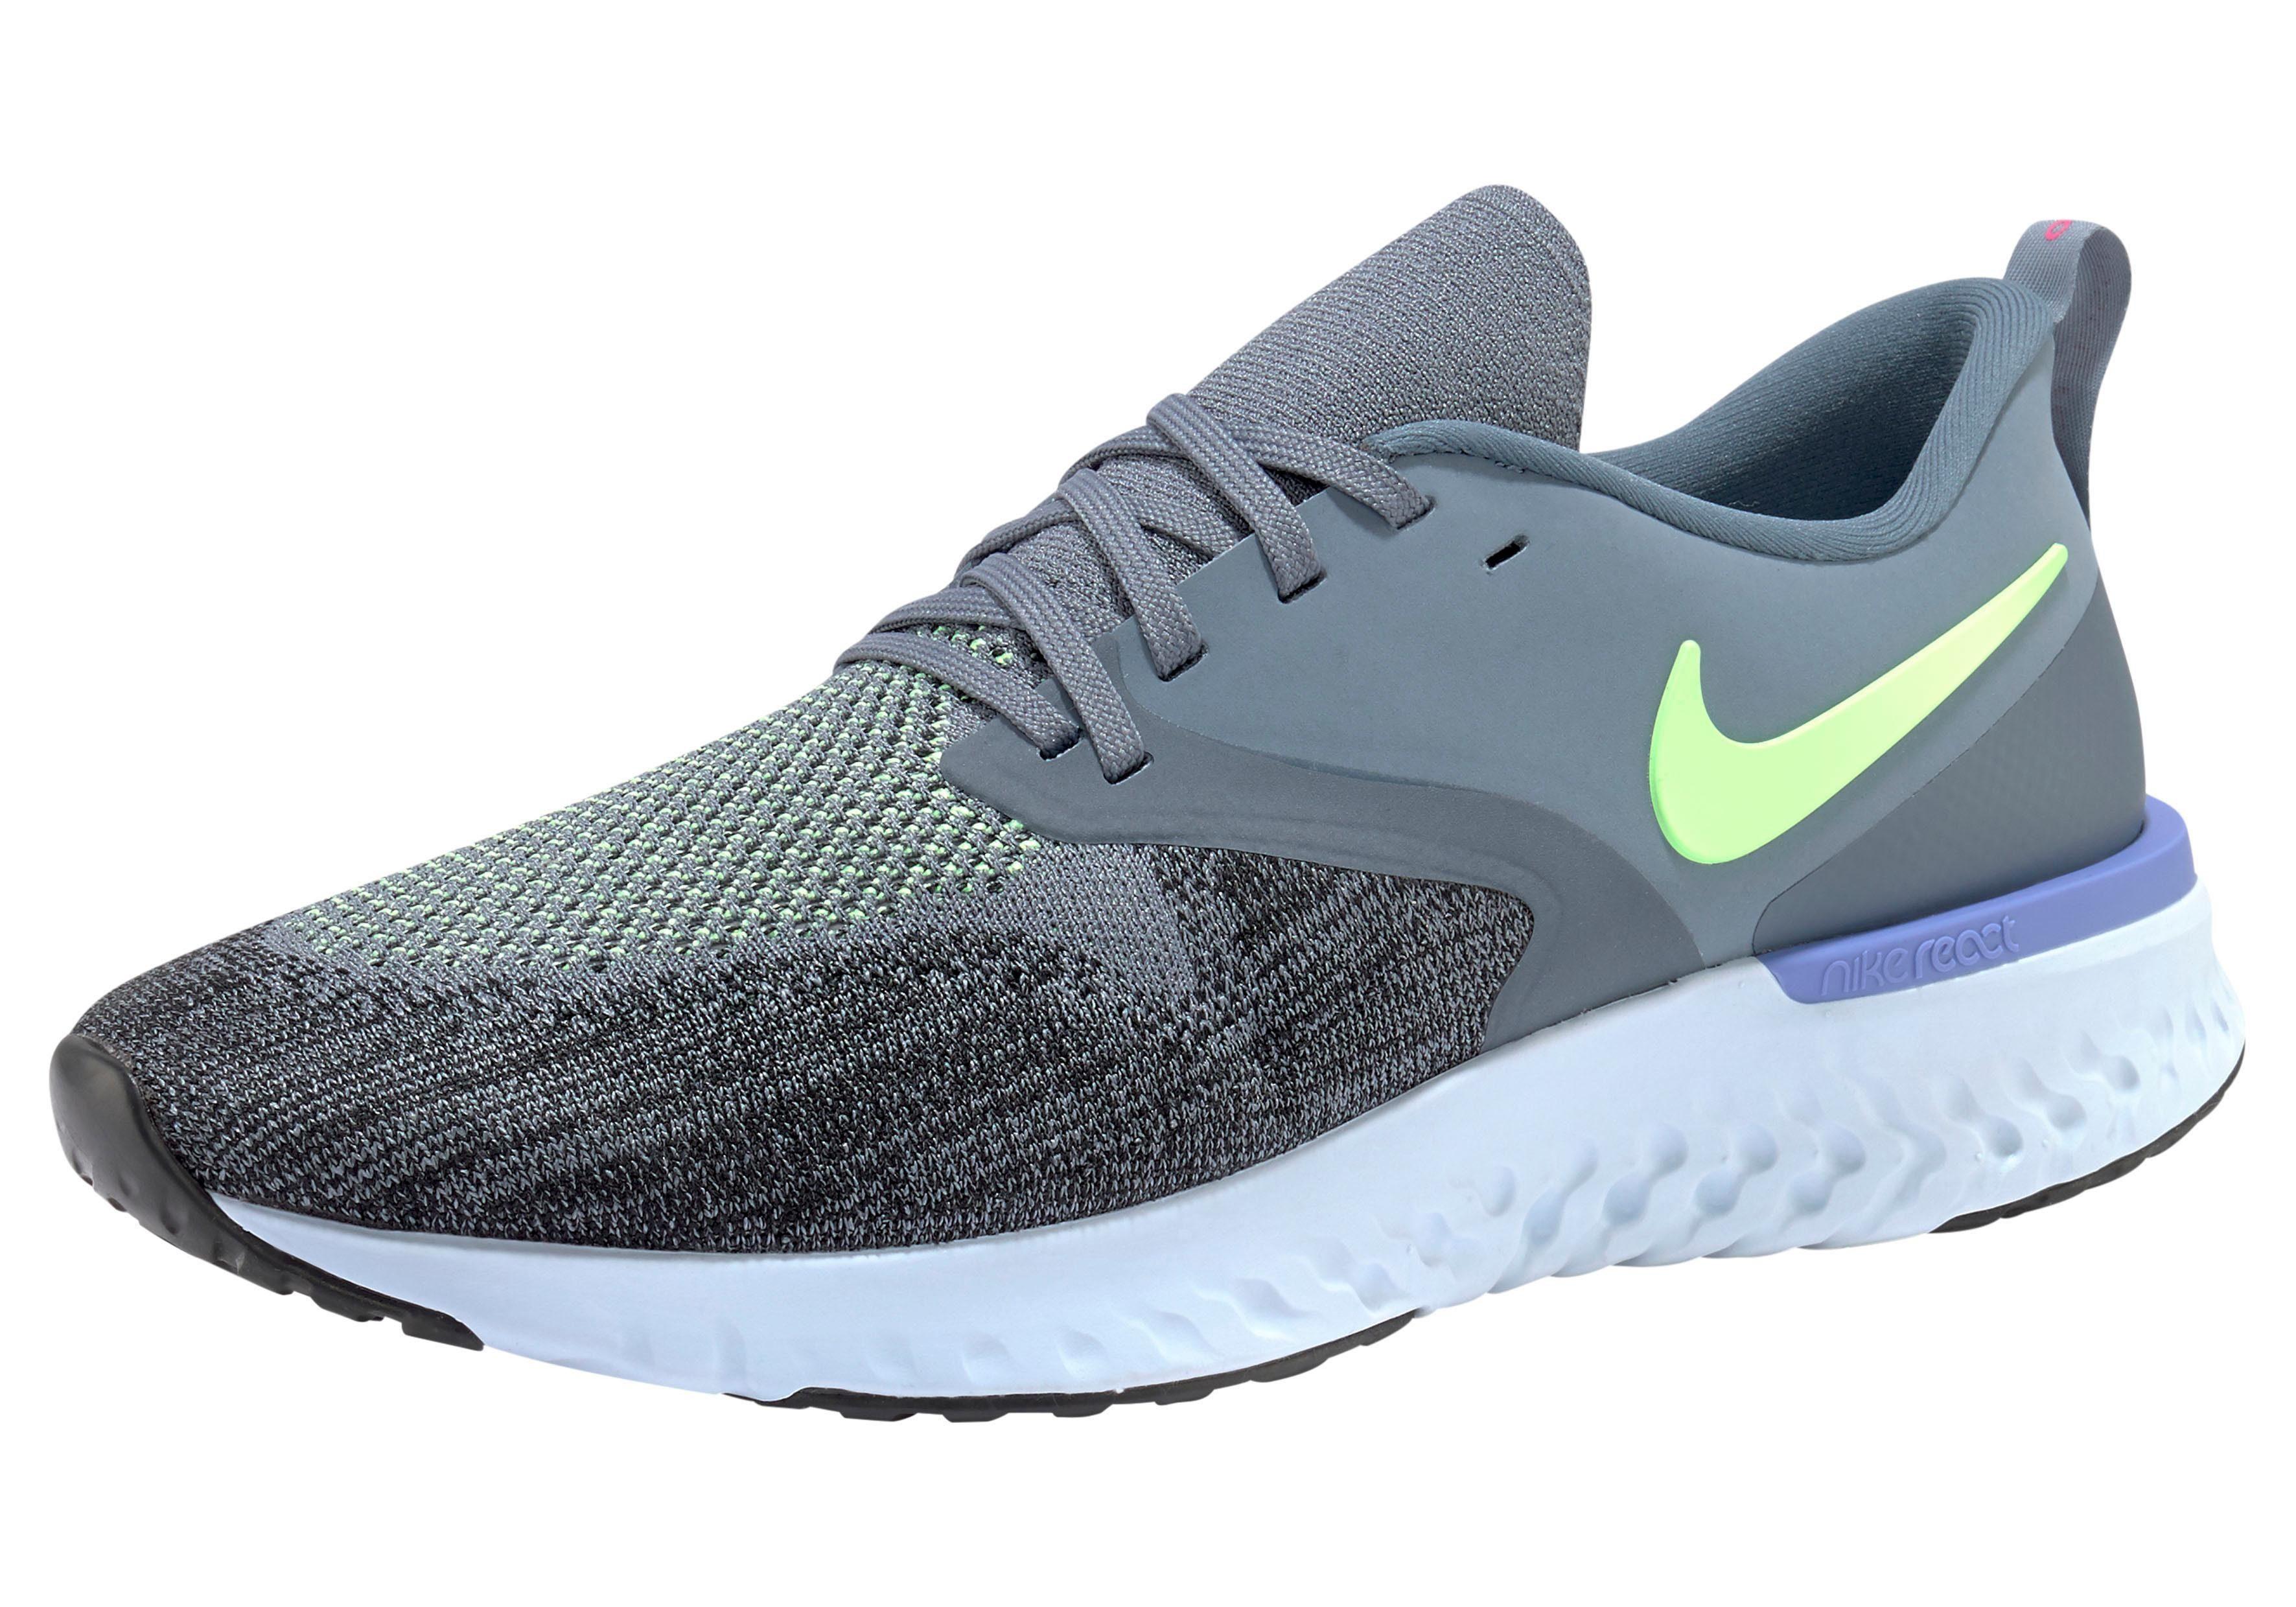 Nike »Odyssey React Flyknit 2« Laufschuh kaufen   OTTO